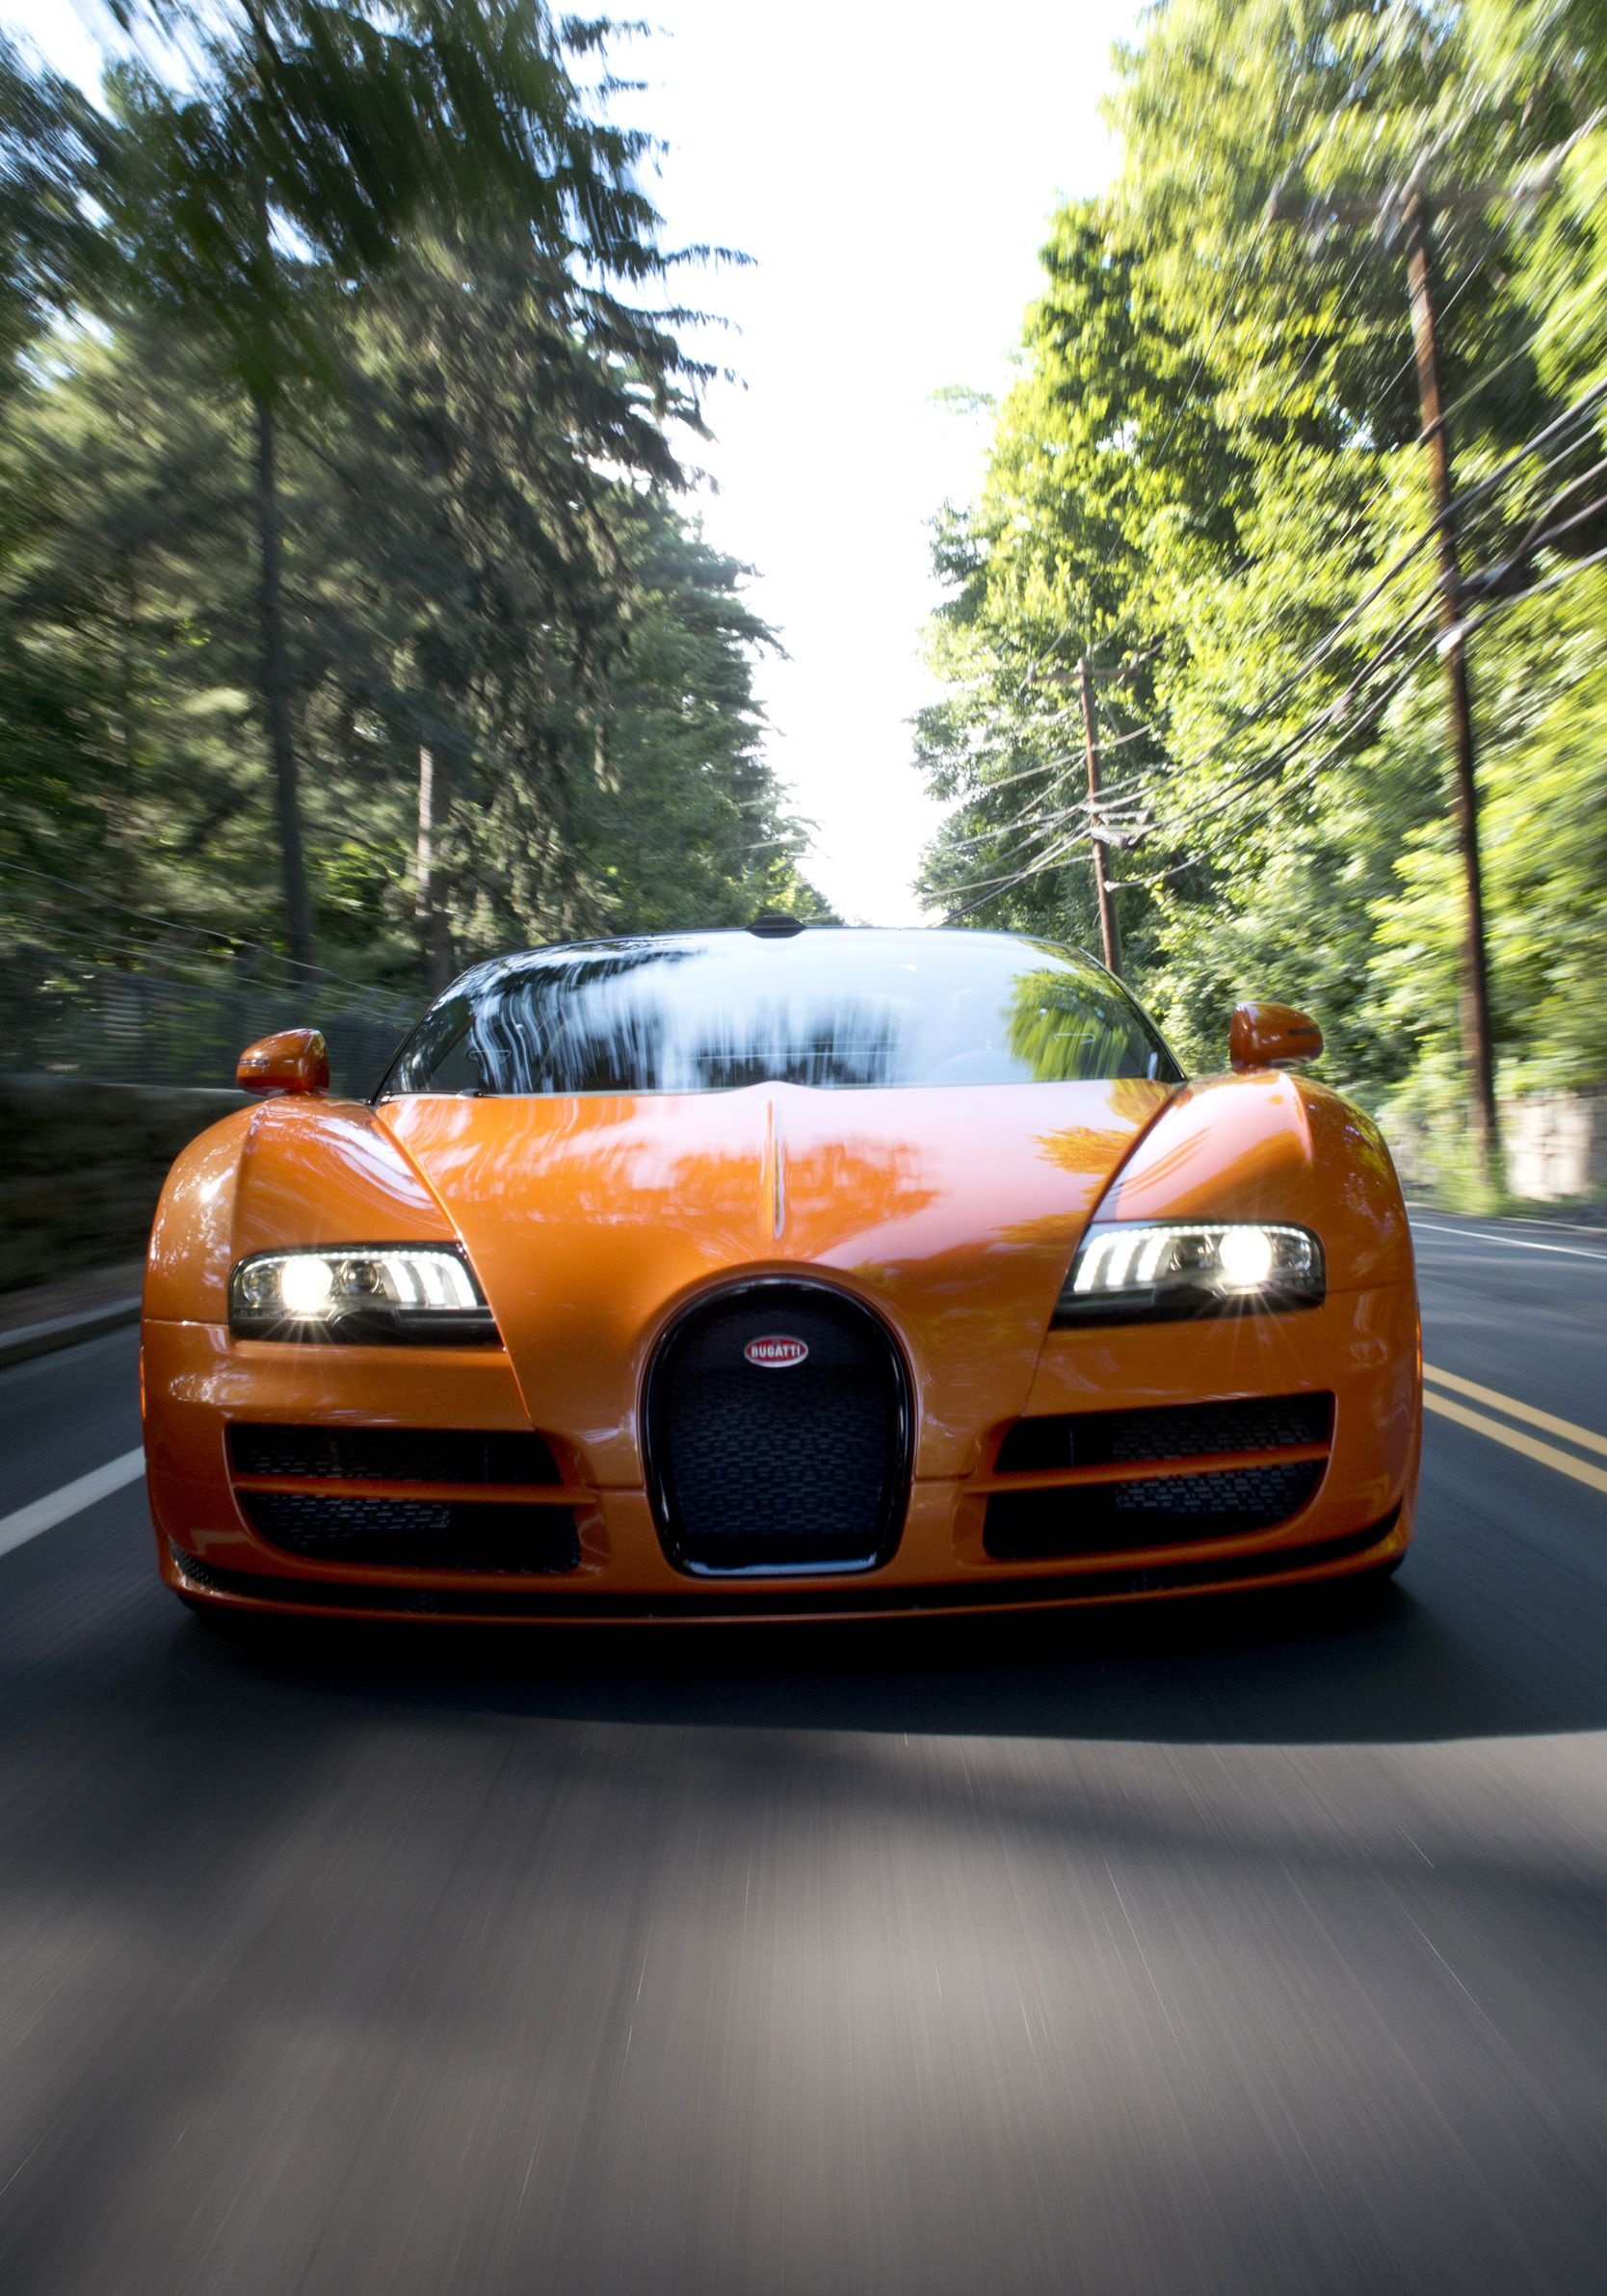 15188561a7f8c597a62d1b15211aec41 Astounding Xe Bugatti Veyron Grand Sport Vitesse Cars Trend